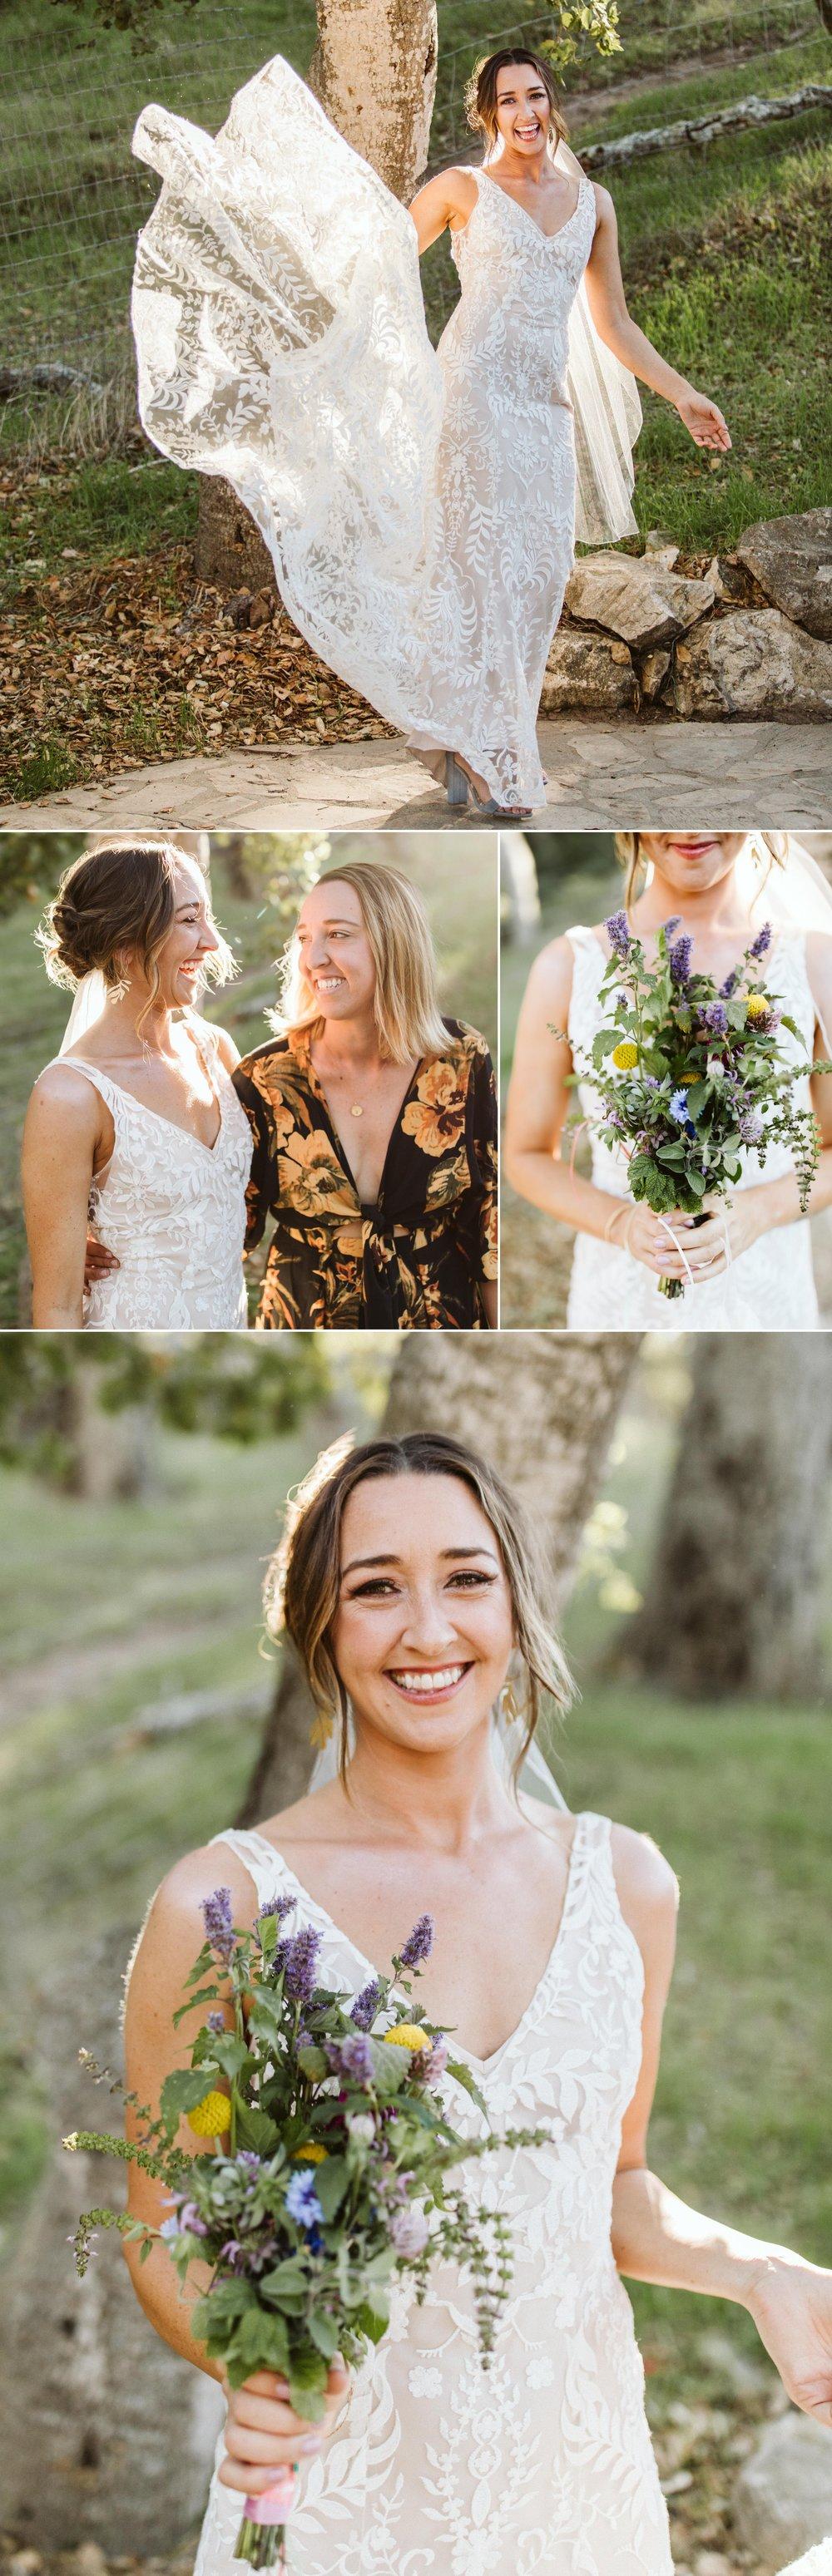 Colorful Barn Wedding at Jalama Canon Ranch- Lompoc- Santa Barbara- Geoff & Lauren 14.jpg